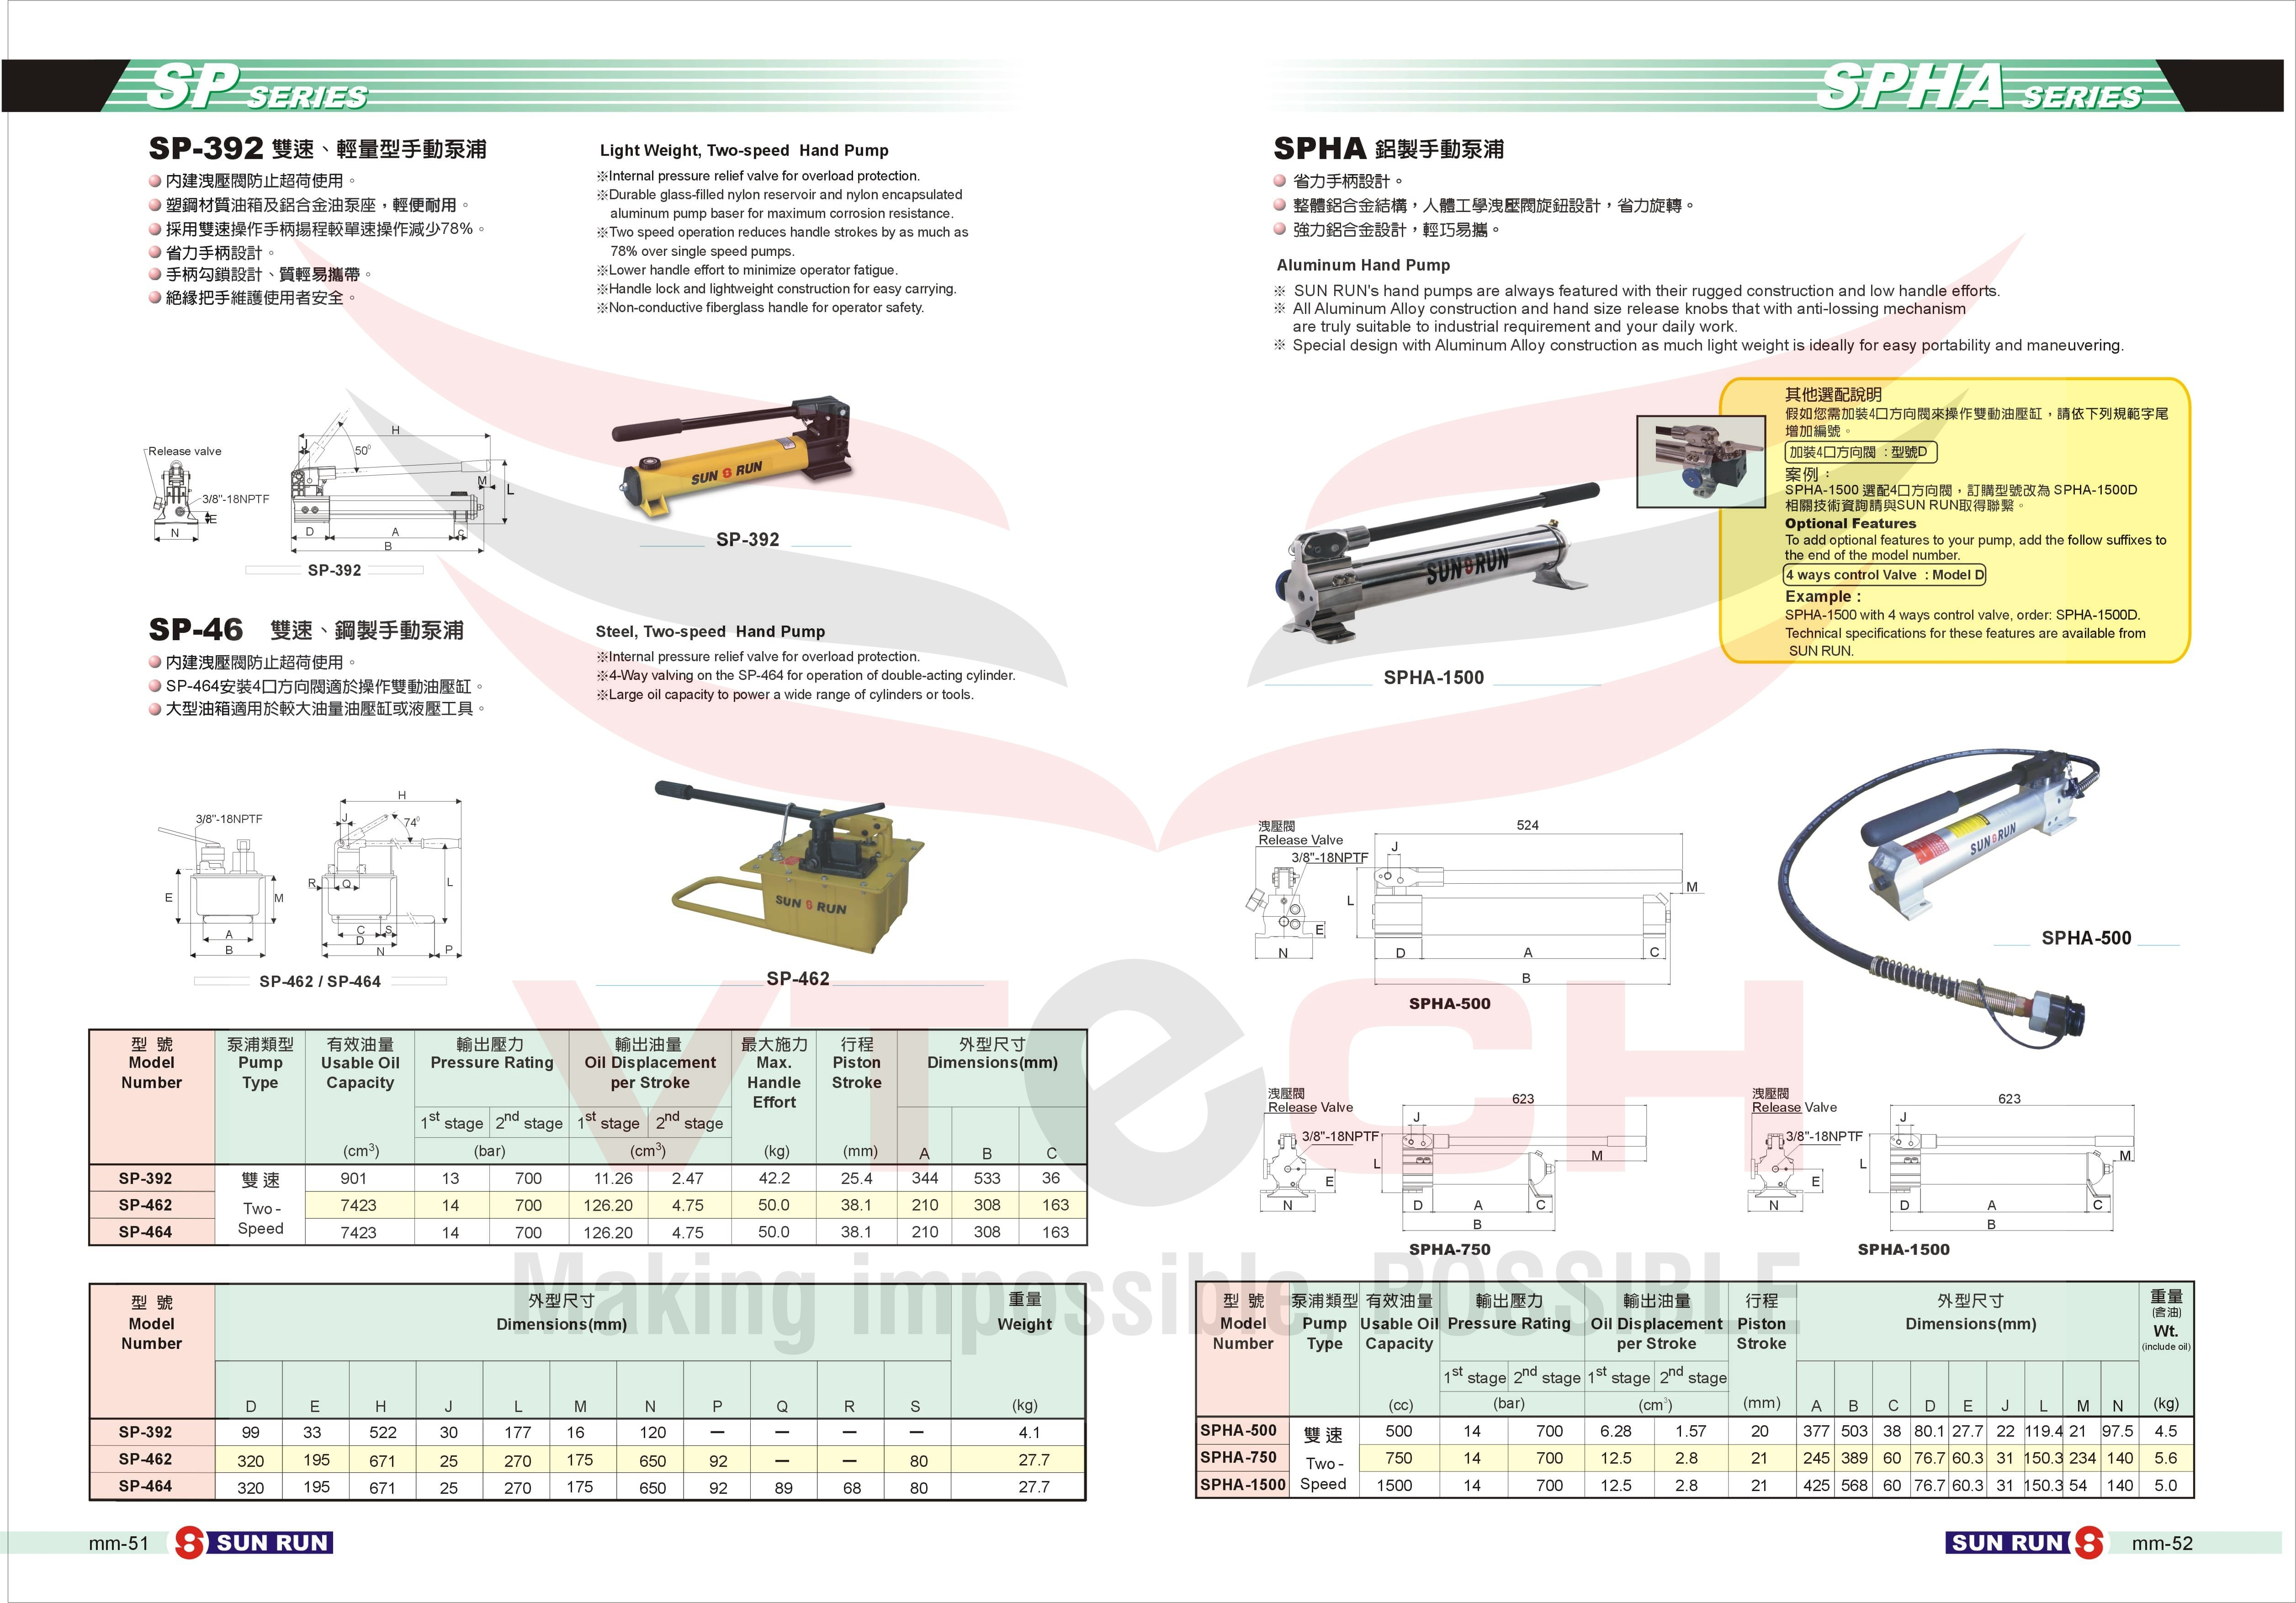 SP Series Hand Pumps